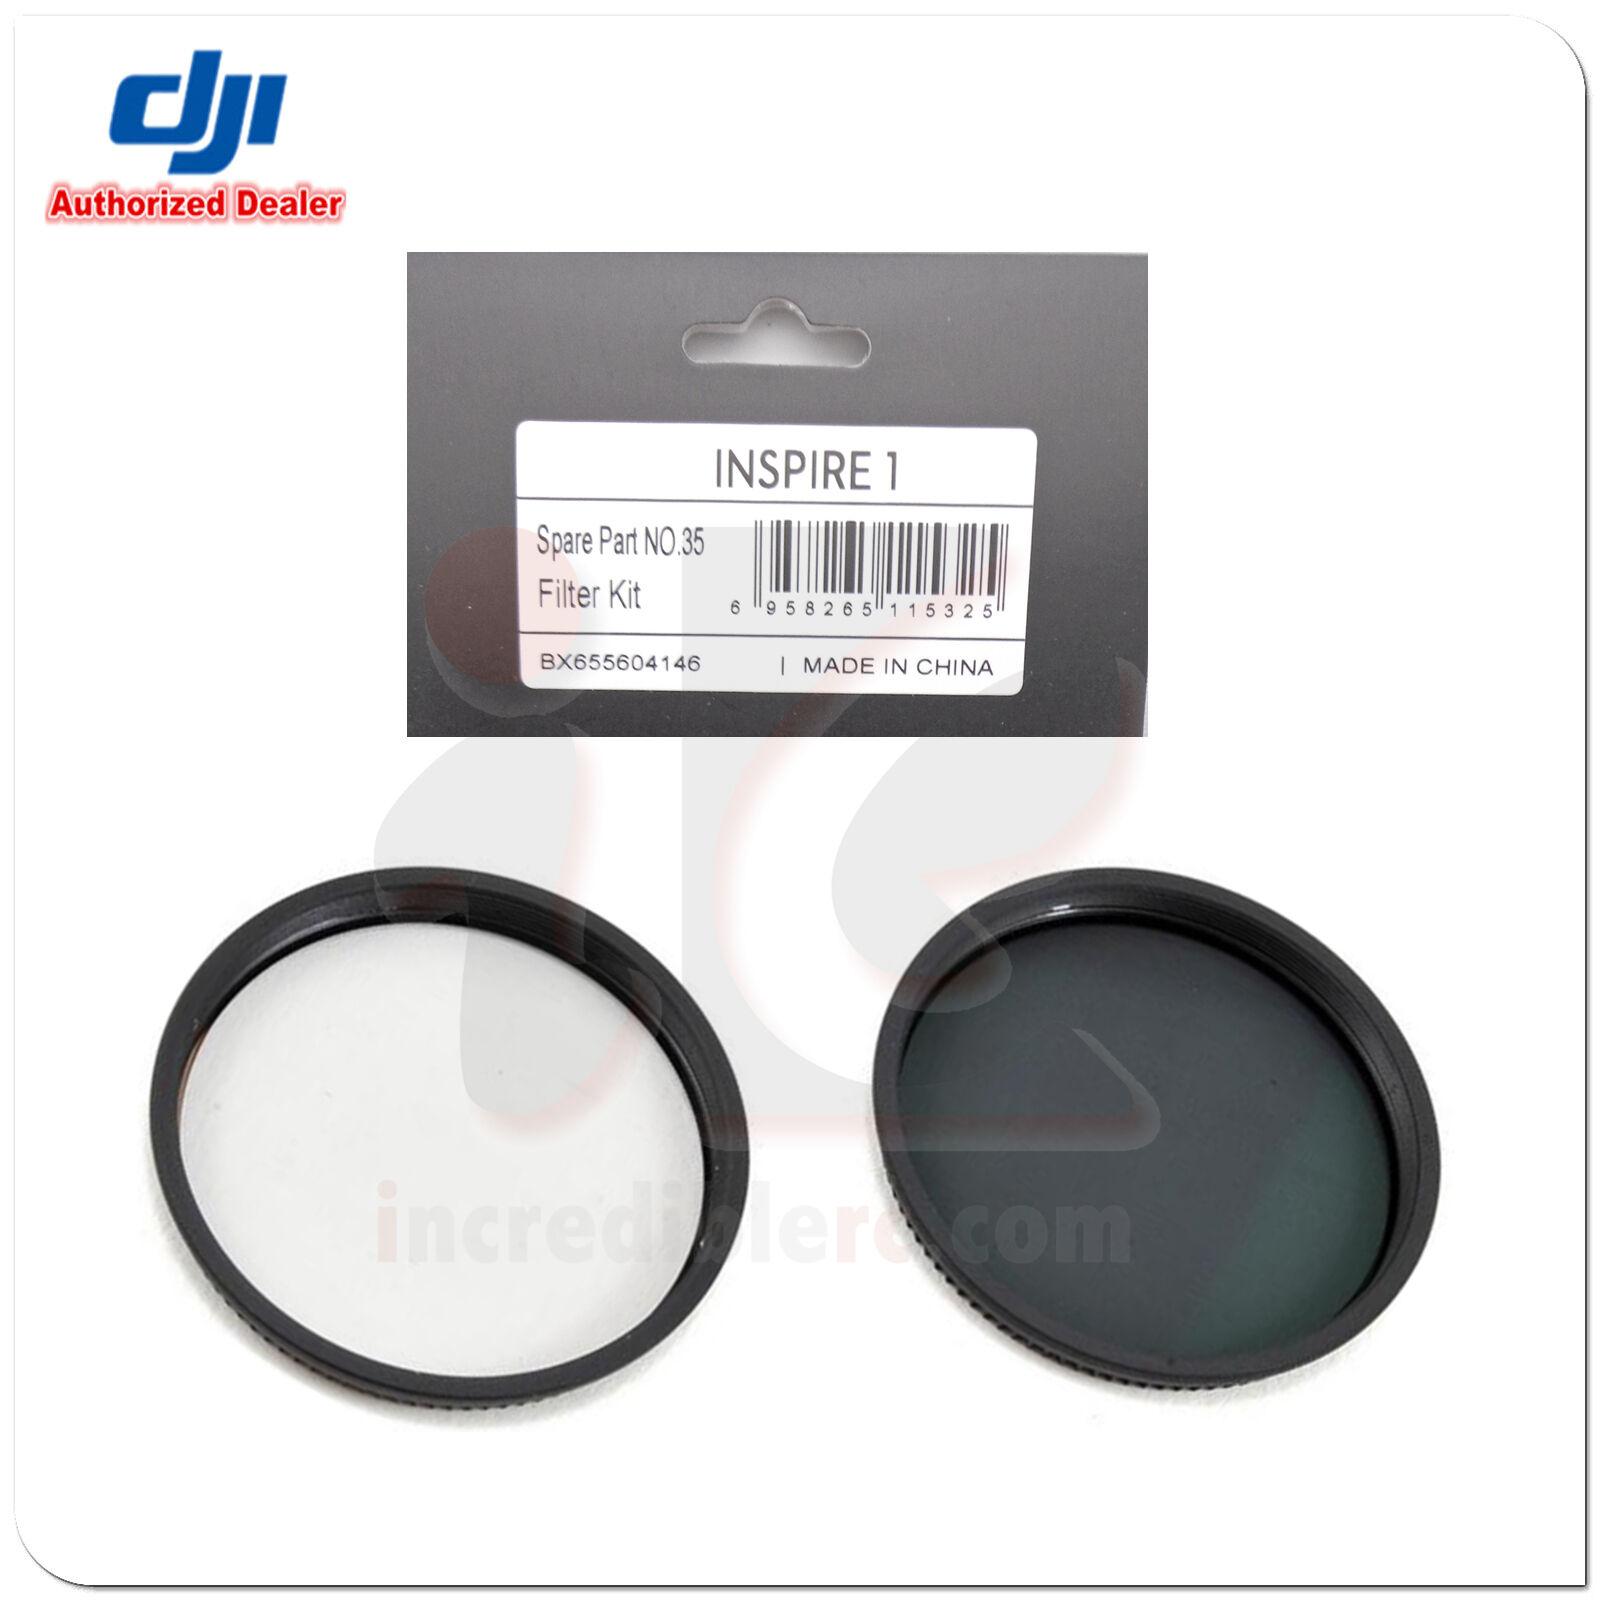 DJI RC Camera Drone Quadcopter FPV - DJI Inspire 1 Part 35 Filter Kit